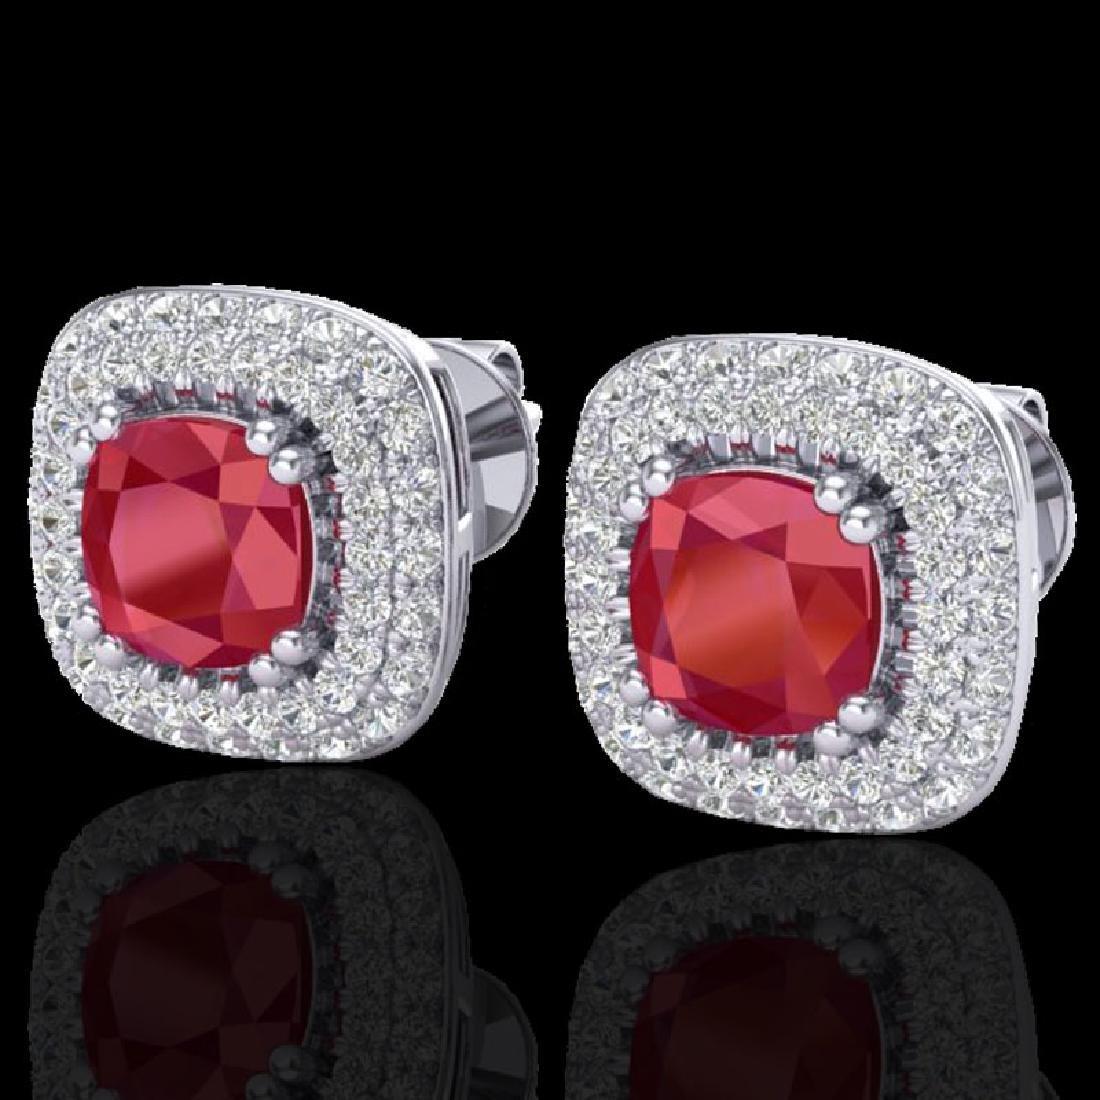 2.16 CTW Ruby & Micro VS/SI Diamond Earrings Solitaire